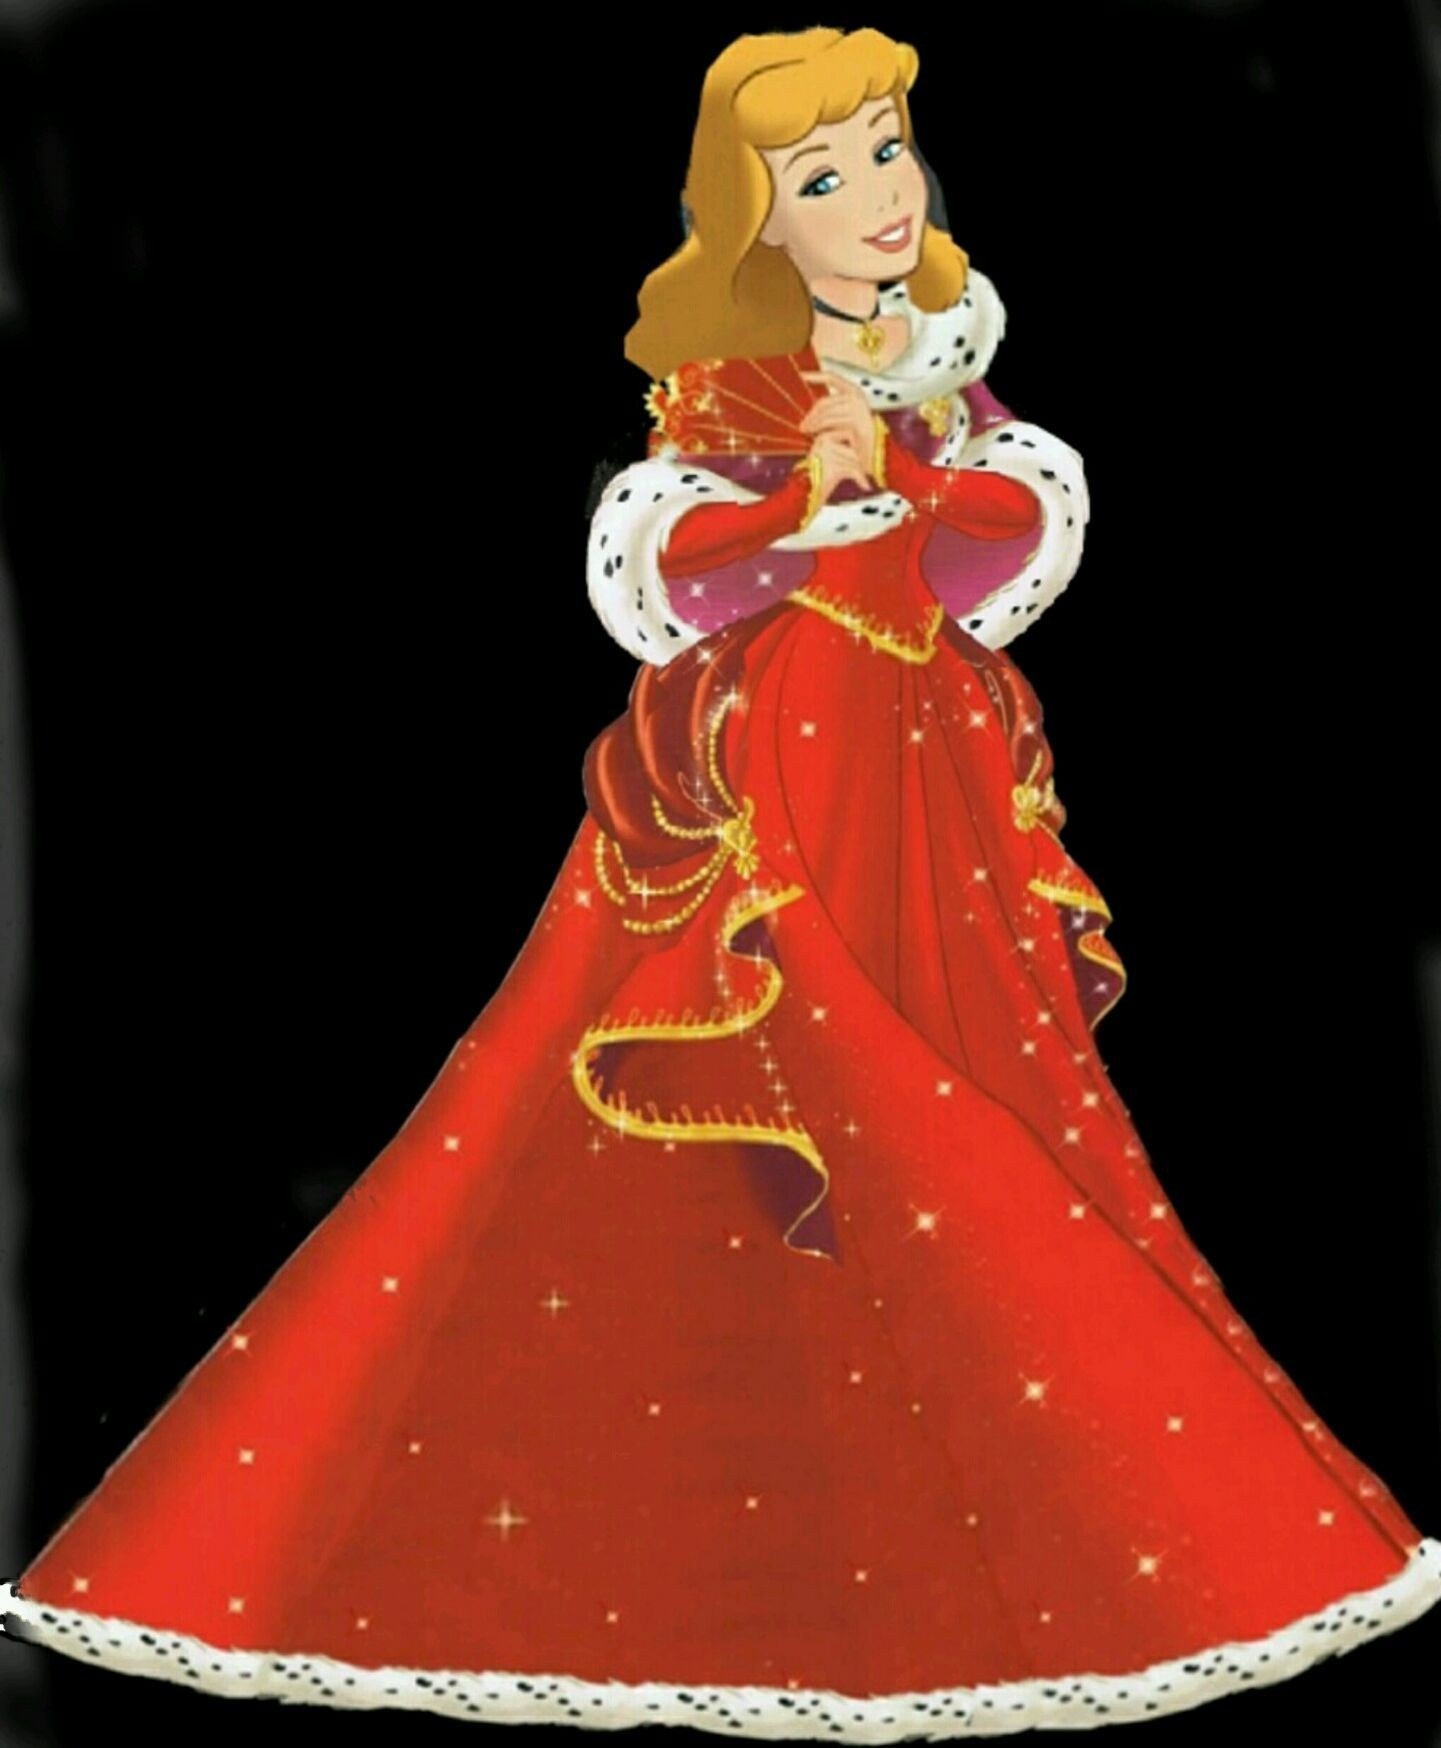 Cinderella Princess Merry Christmas and New Year